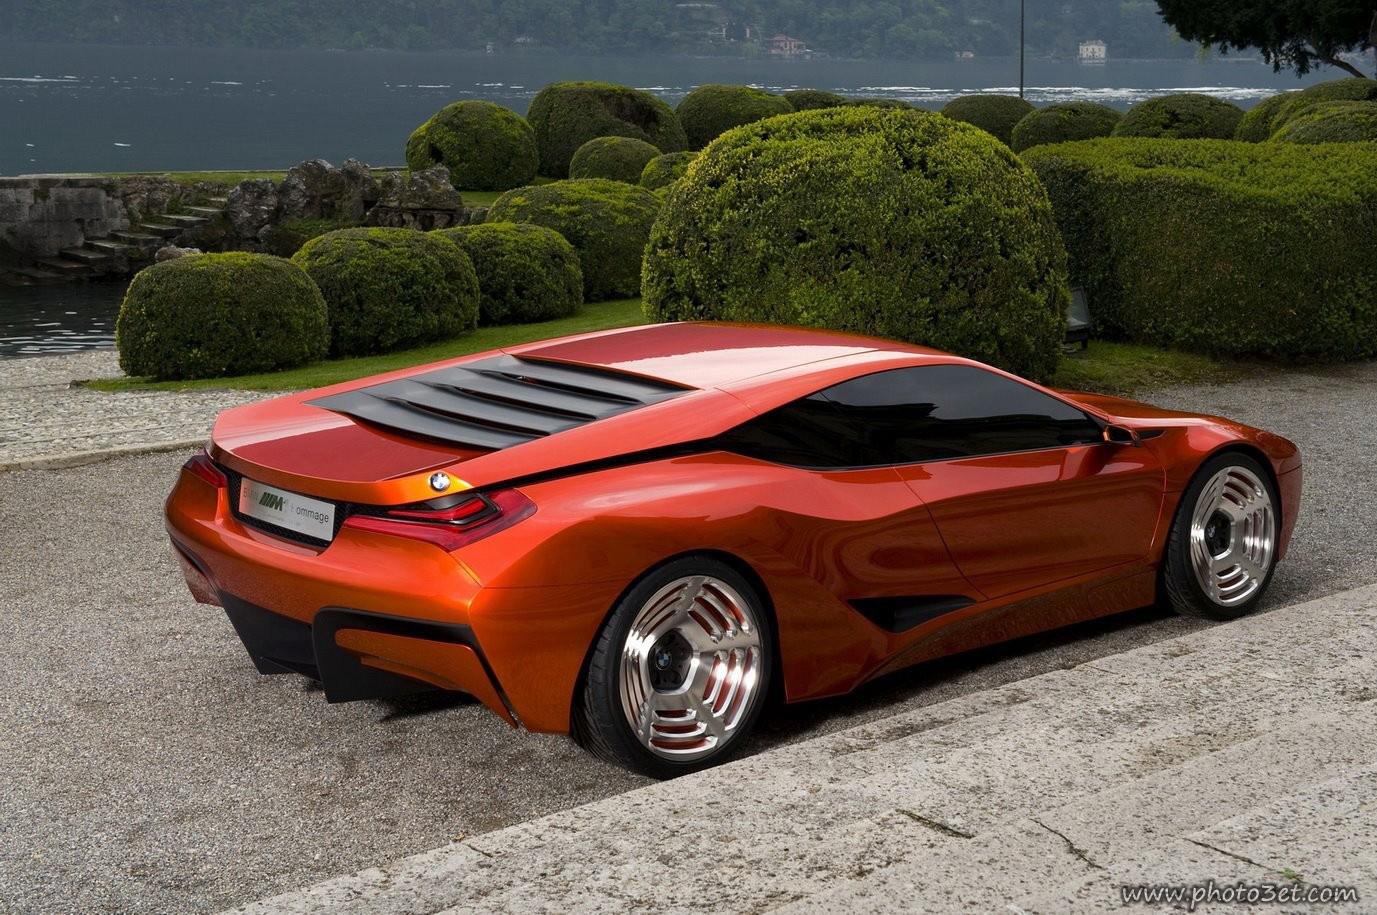 جدیدترین ماشین اسپرت سال امریکایی